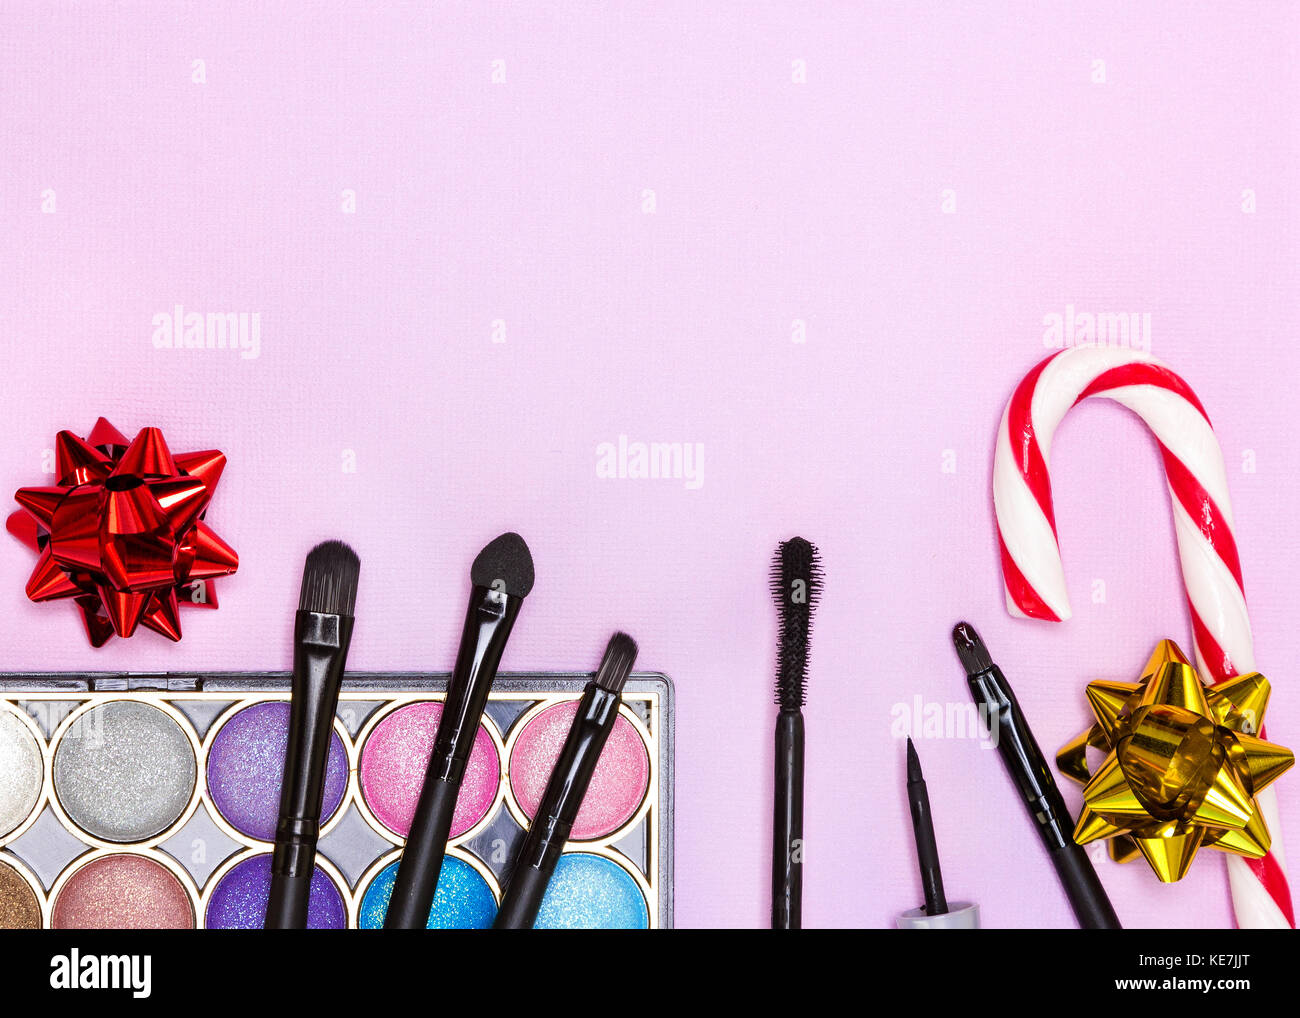 Weihnachten Make-up Kosmetik. Helle farbe Glitzer Lidschatten, schwarzer Eyeliner, Mascara, Lipgloss, Make up Pinsel Stockbild